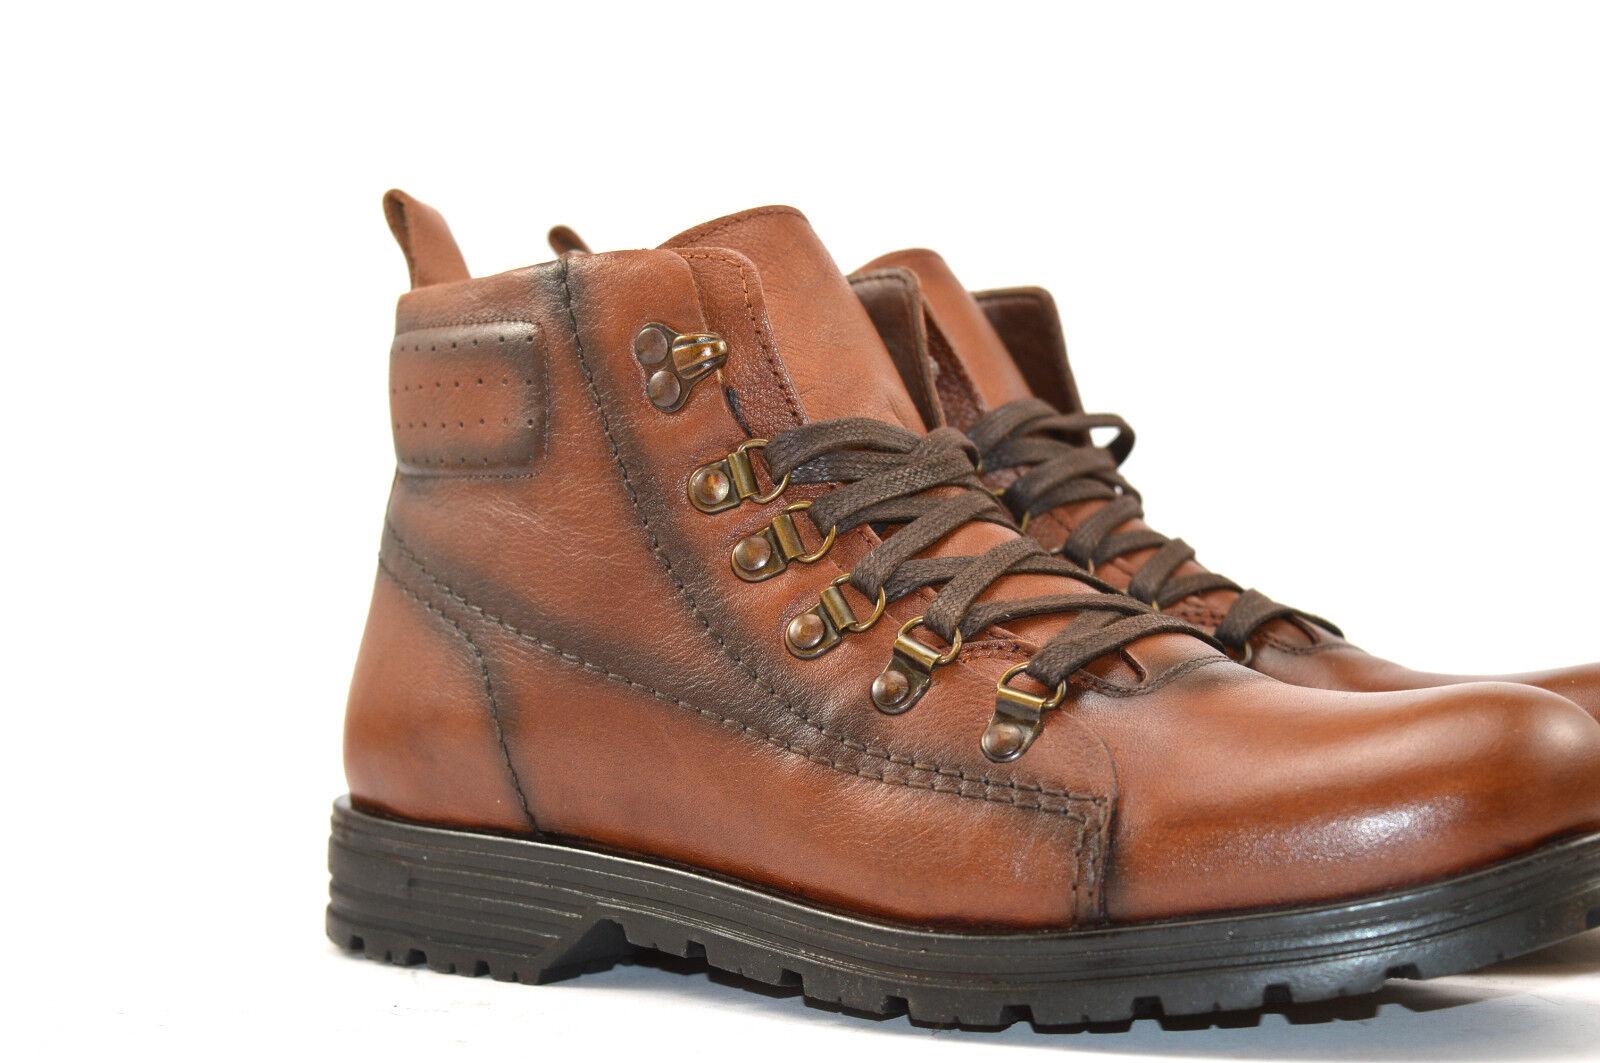 Neu Herren Trekkingschuhe Stiefel Stiefel Echtleder Outdoor braun 40 41 42 43 44 6